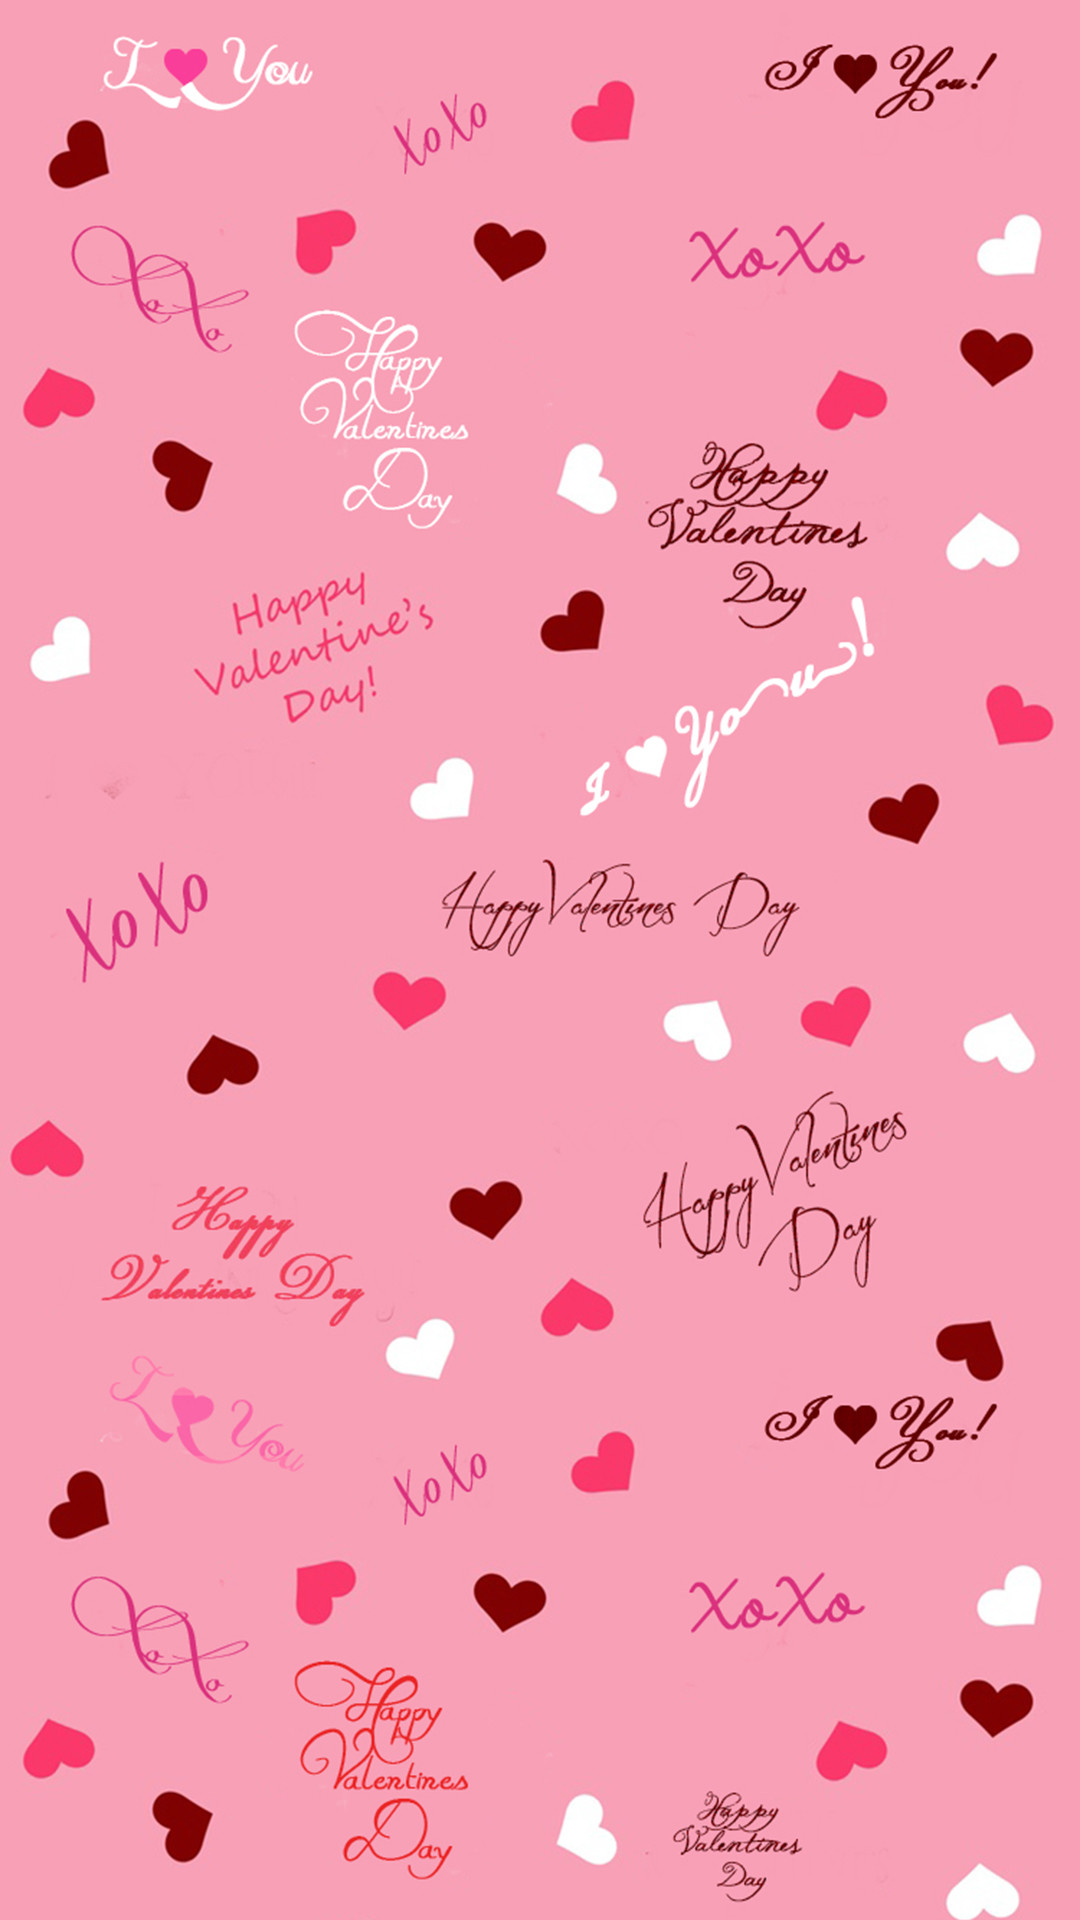 Disney Valentines Wallpaper Backgrounds 55 images 1080x1920